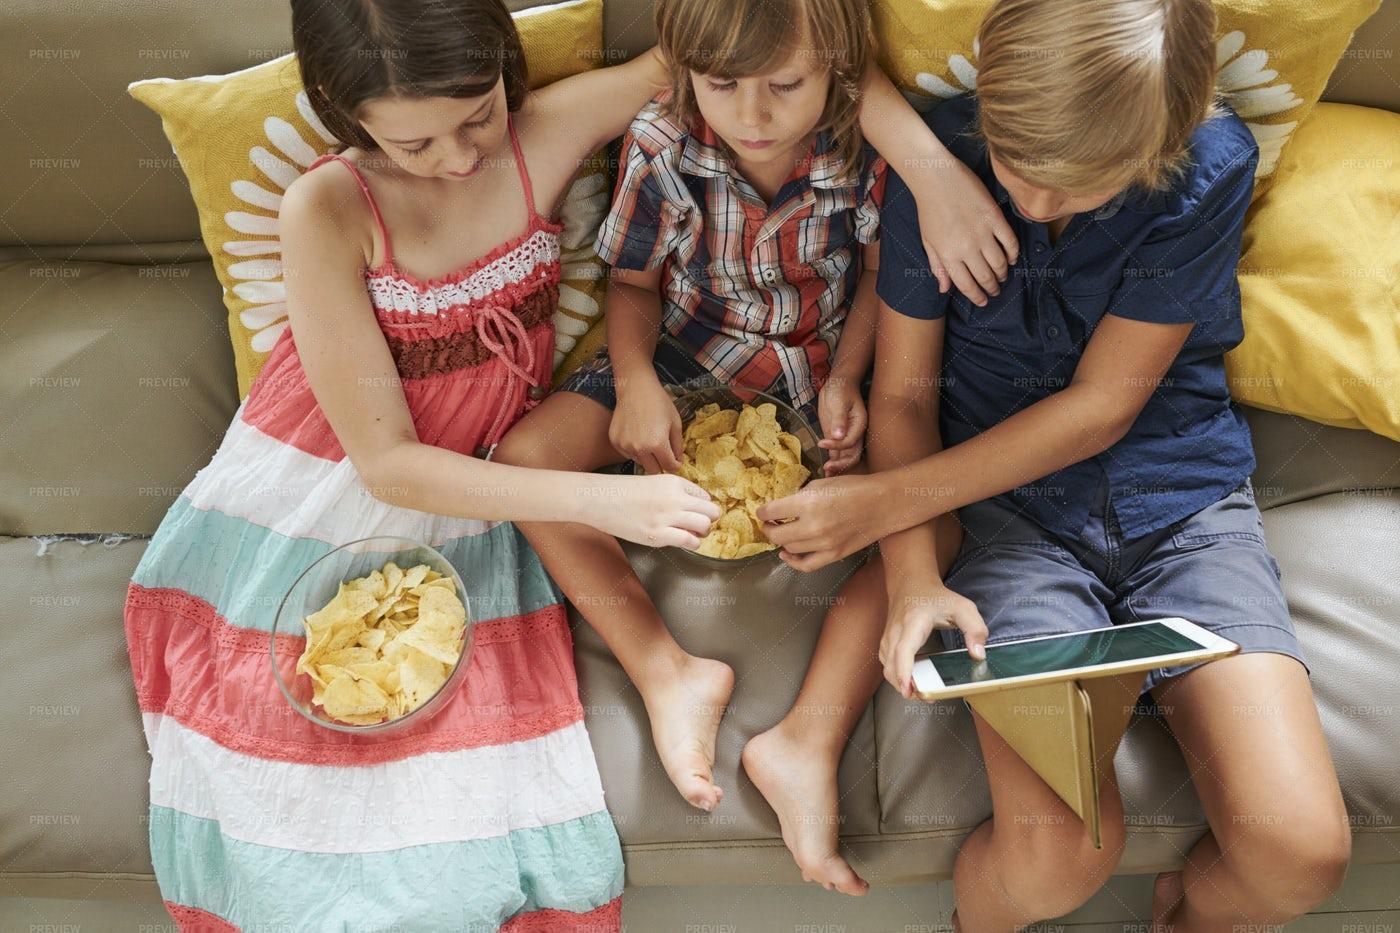 Friends Enjoying Chips And Cartoon: Stock Photos